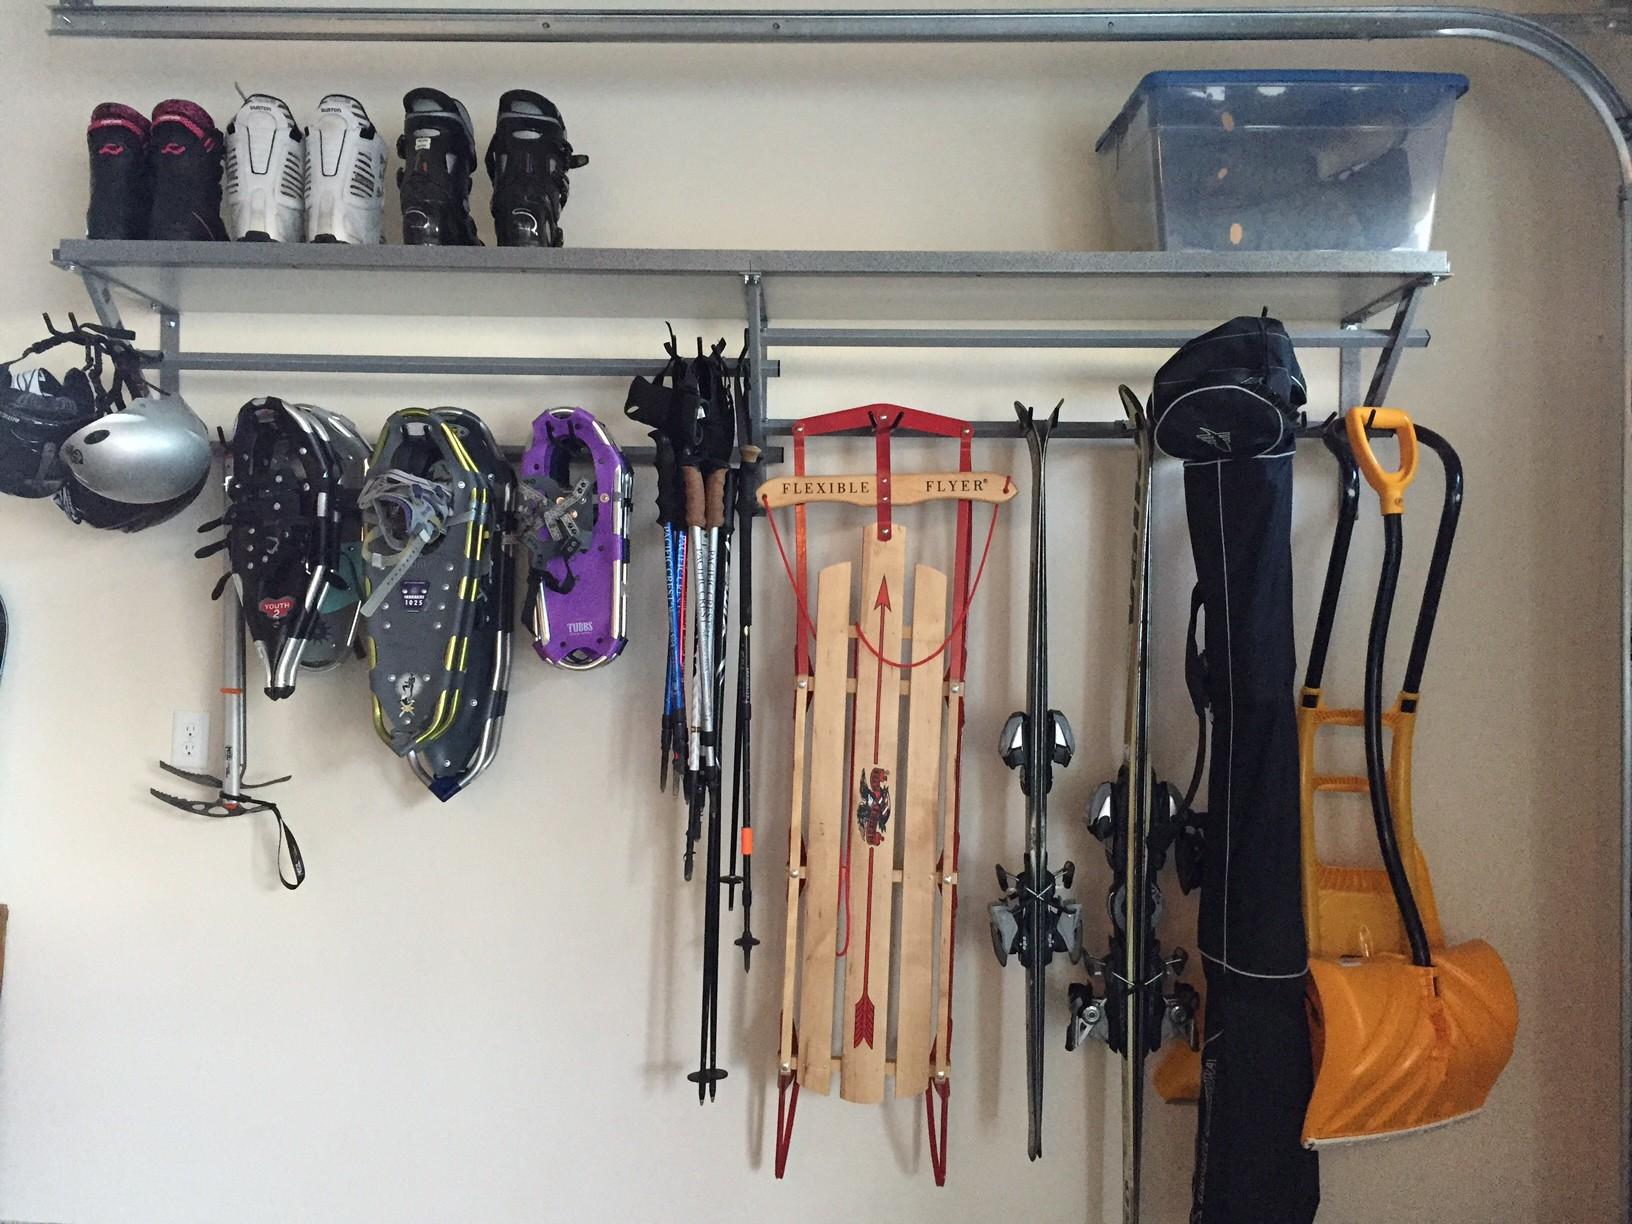 Monkey Bar (company) storage for winter gear.